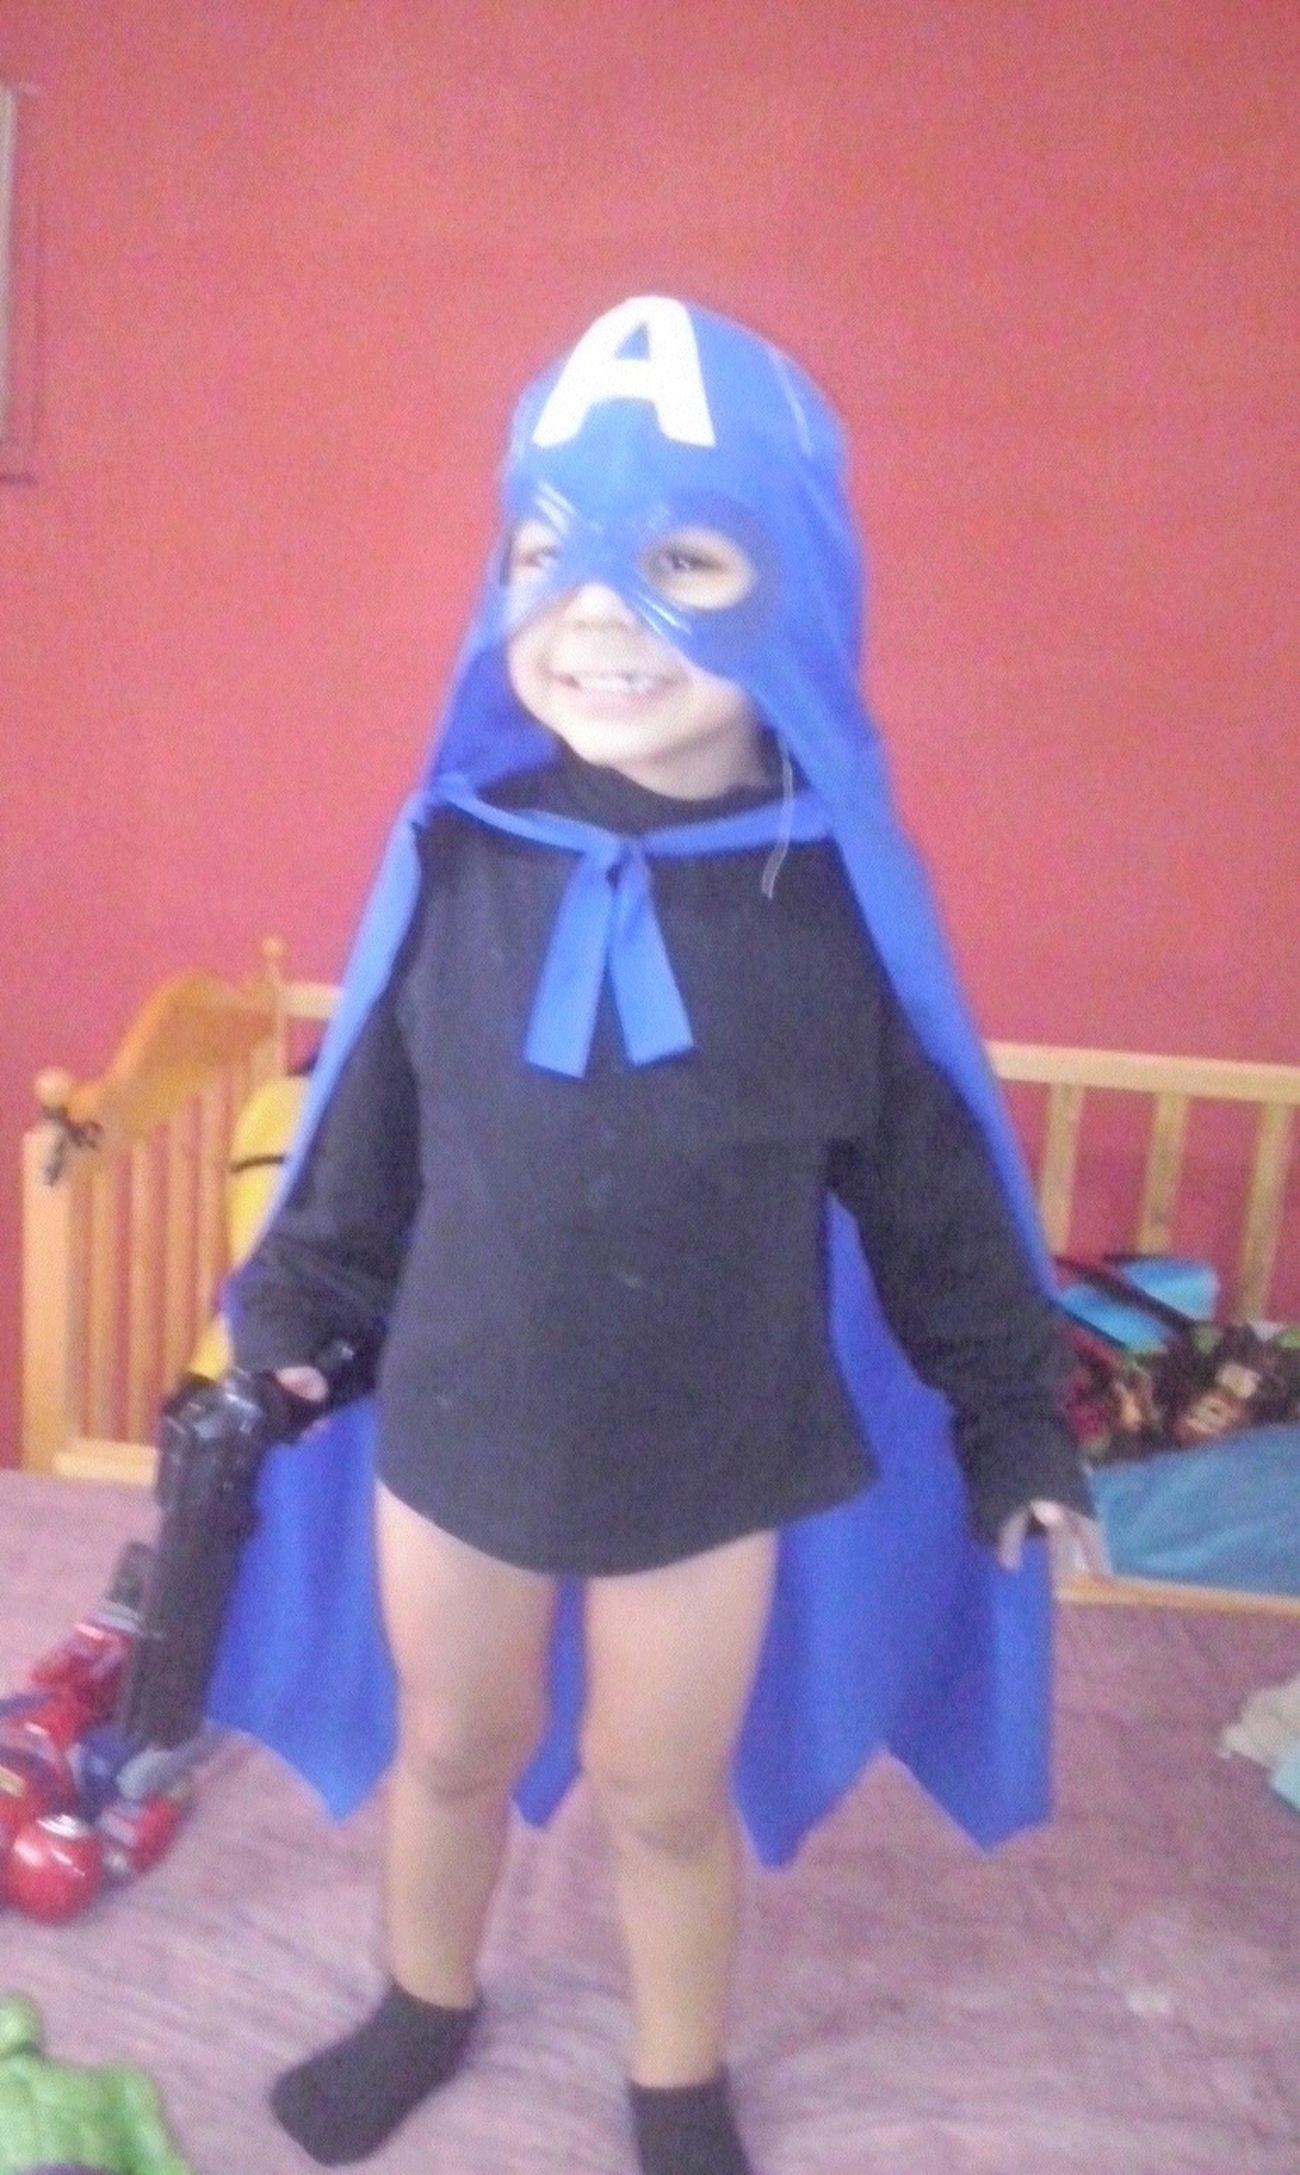 Mi super heroee favoritisimoo